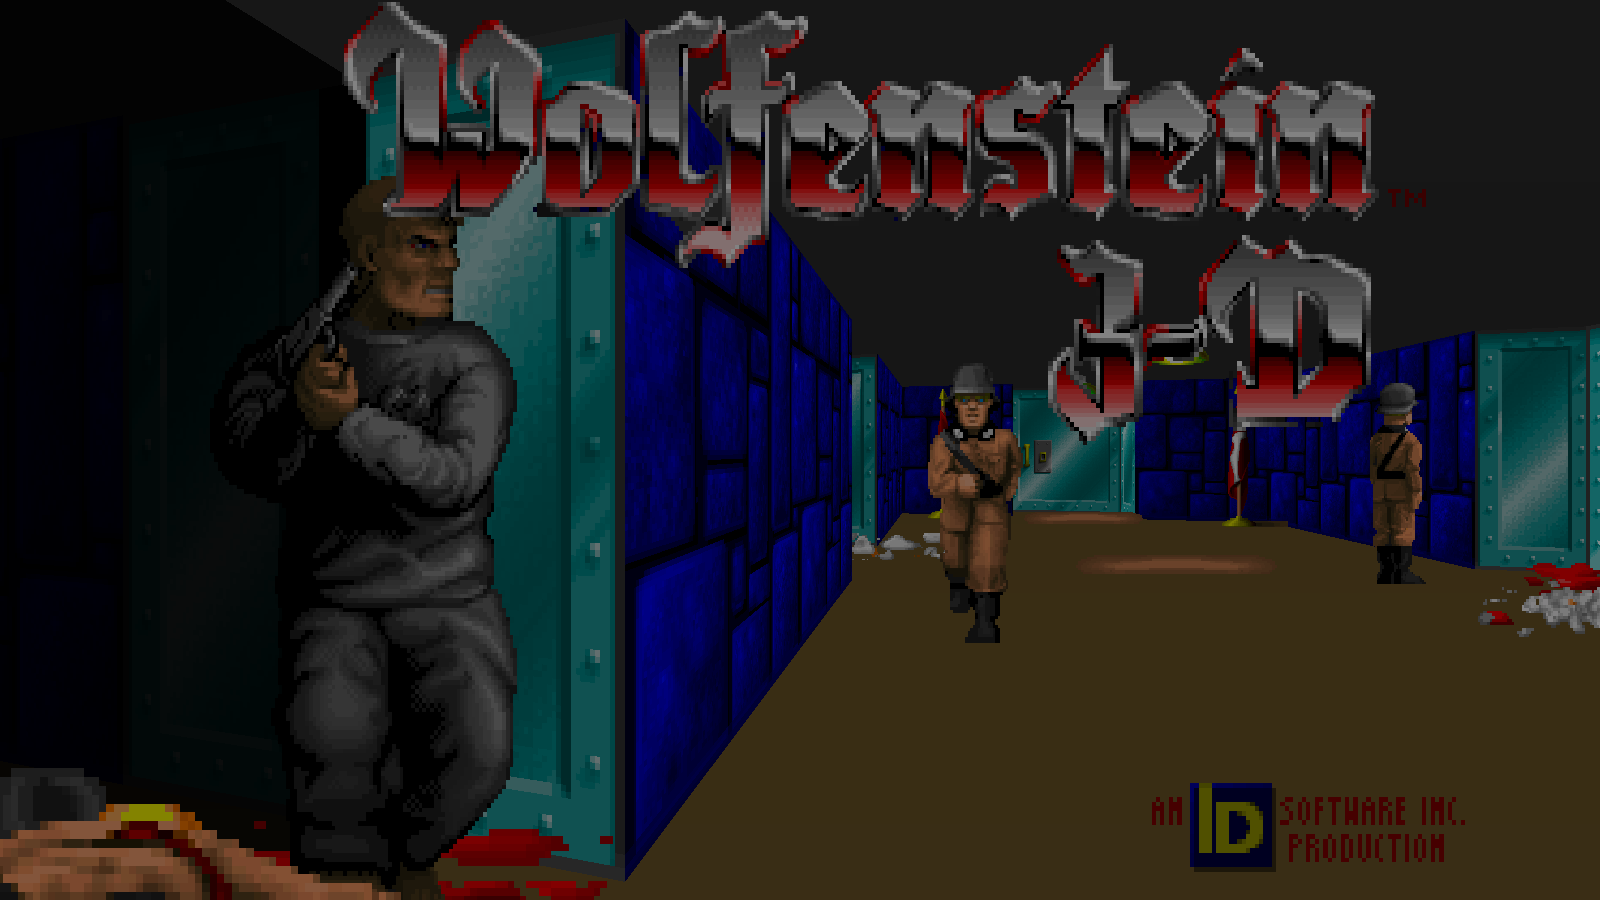 Wolfenstein 3D JaguarPC mod for Doom II - Mod DB